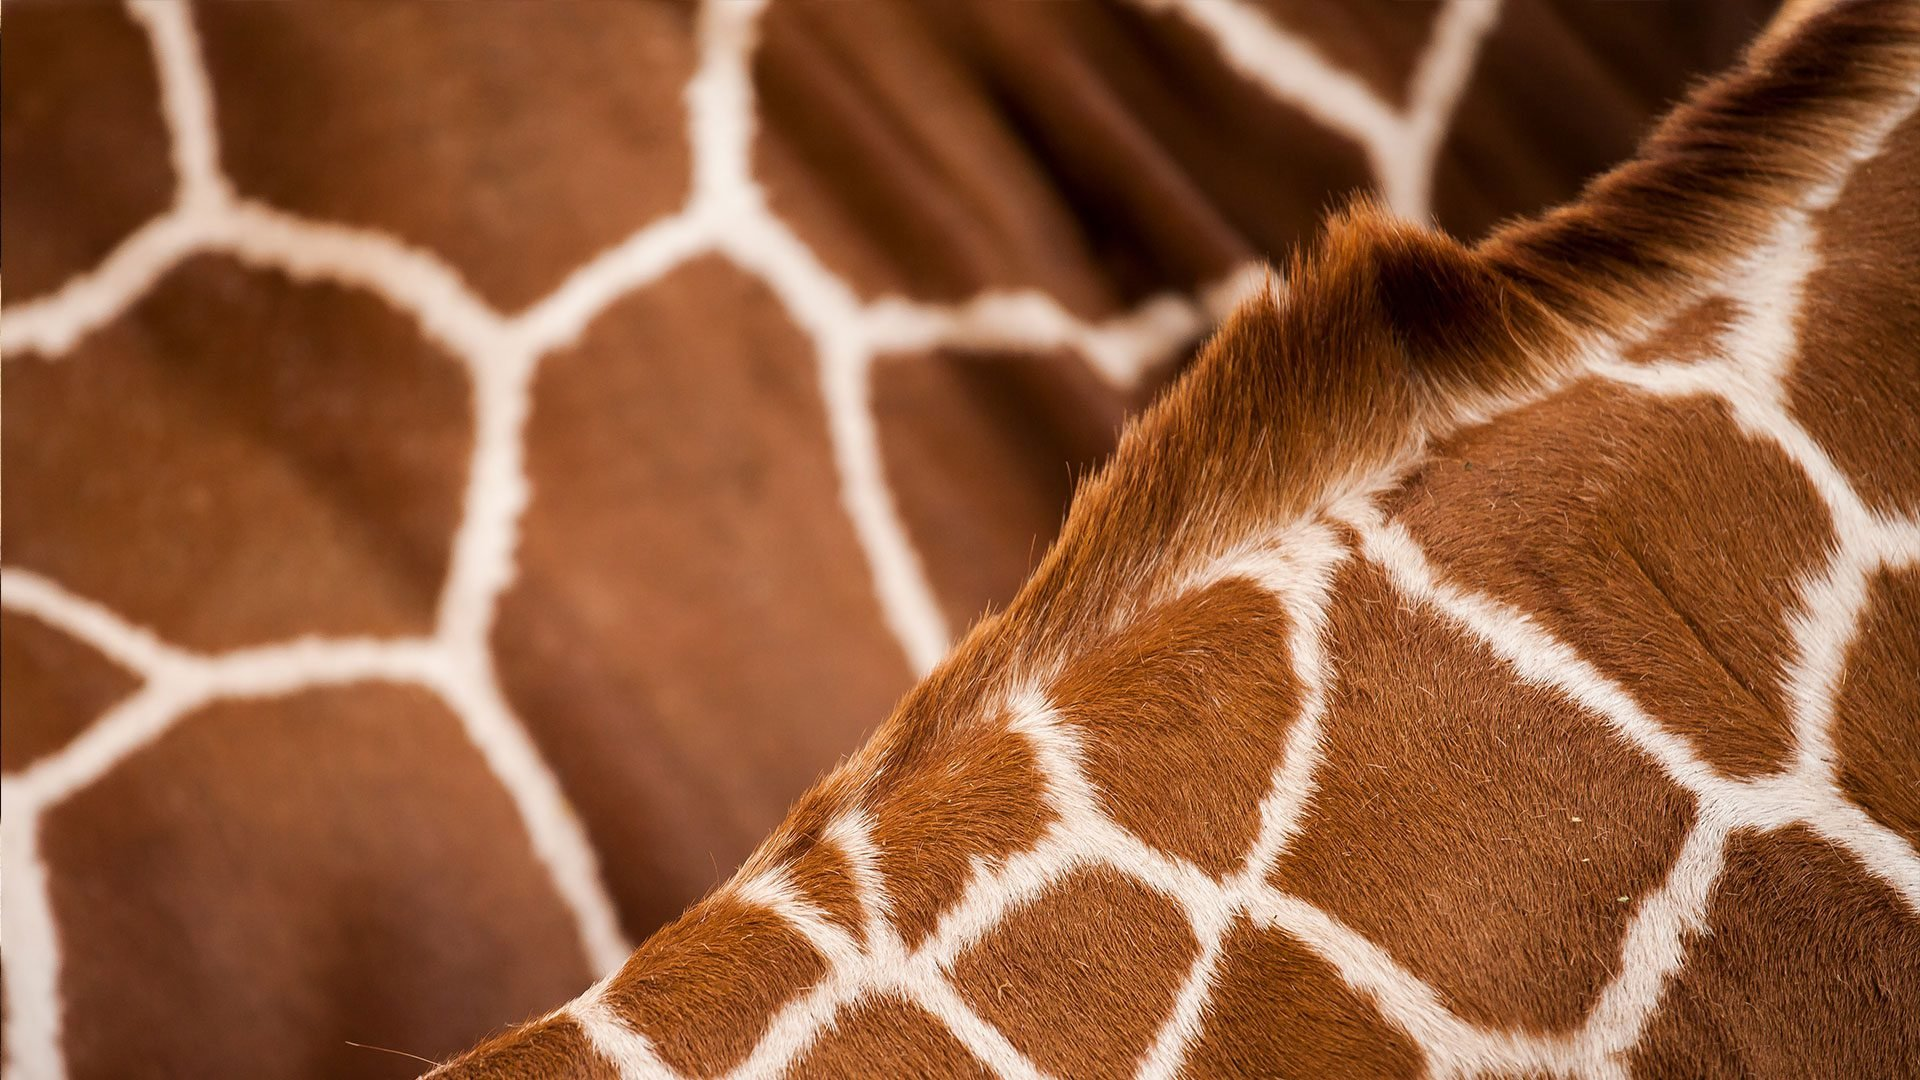 African Safari and Photo